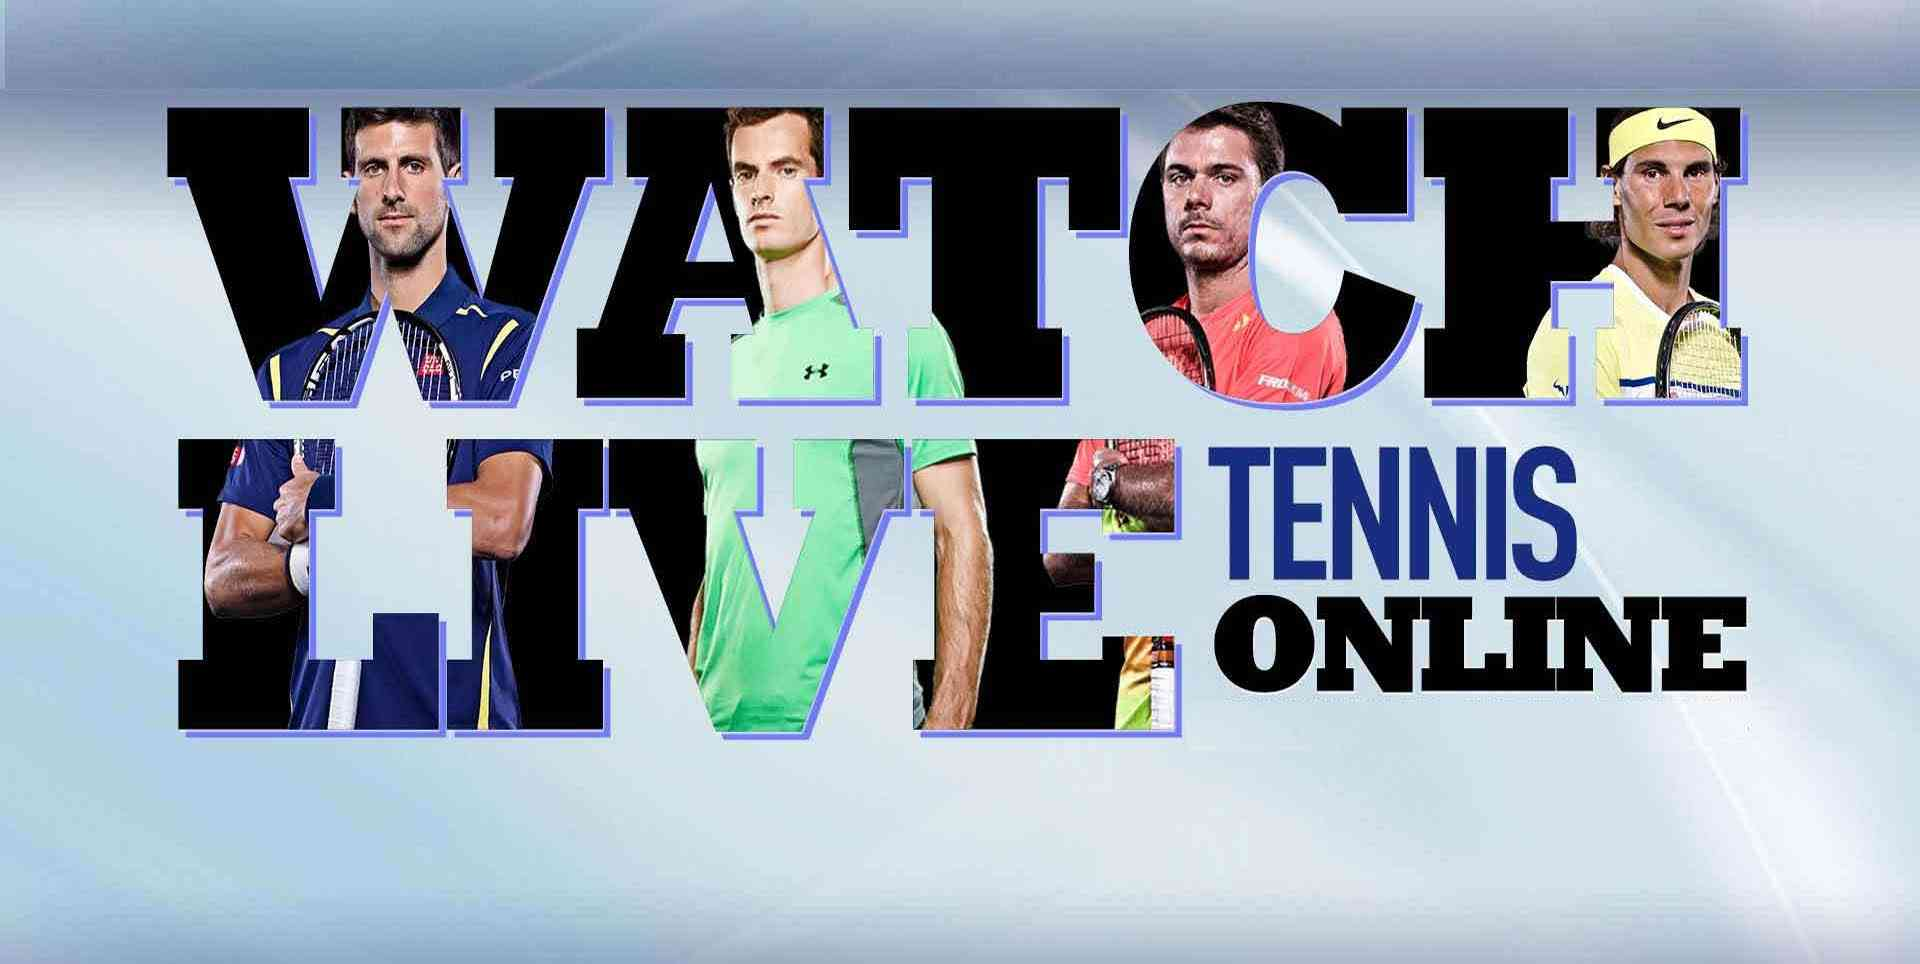 live-t.-kamke-vs-a.-zverev-quarterfinals-online